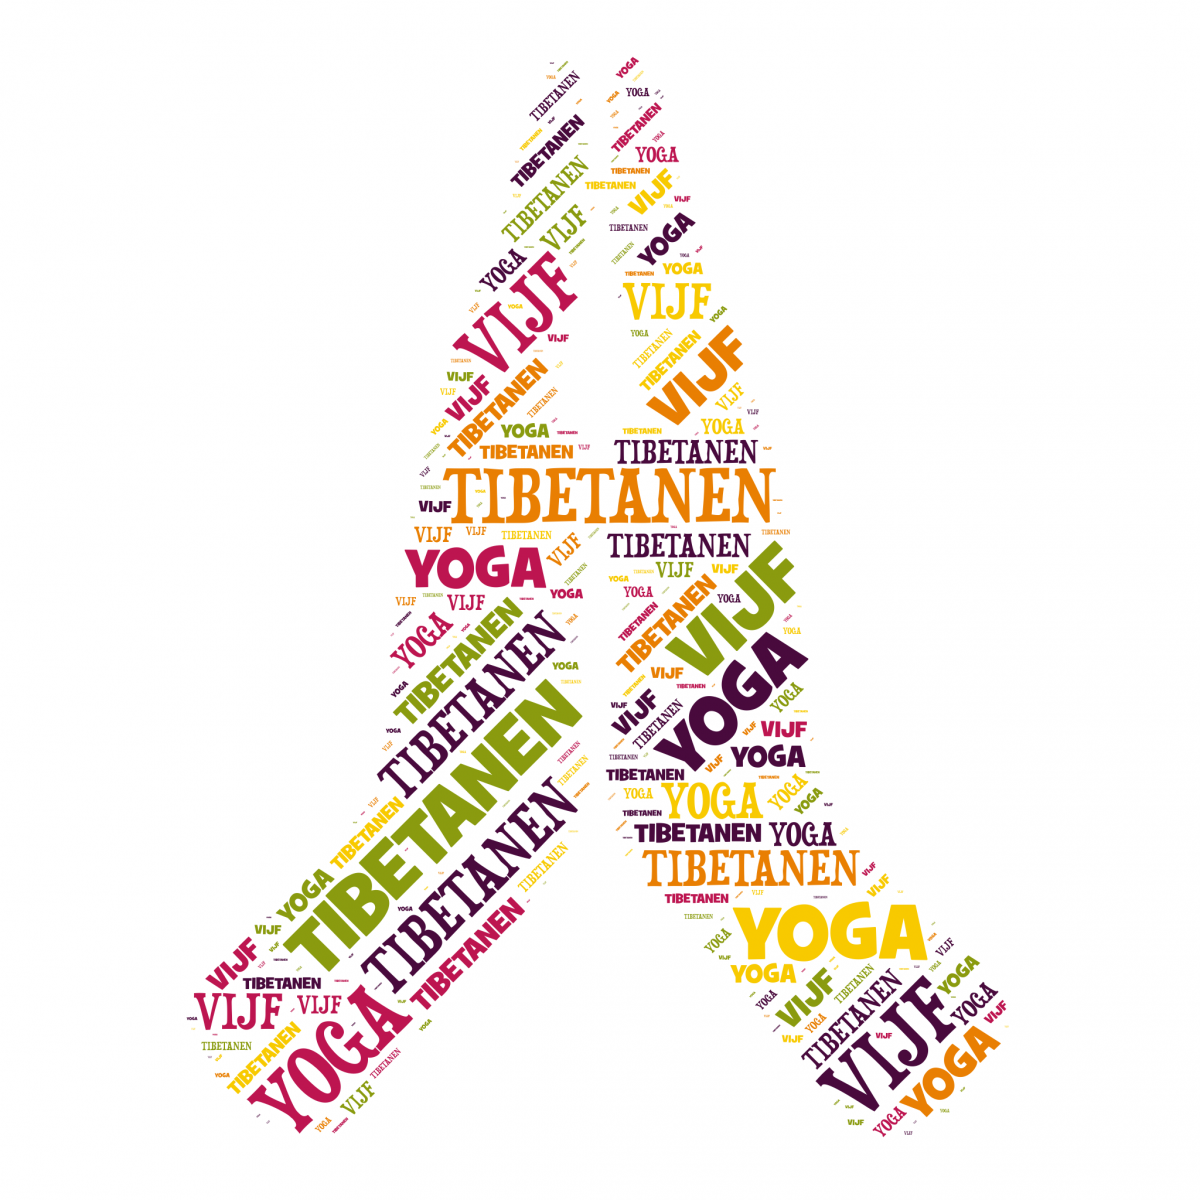 5 tibetanen yoga